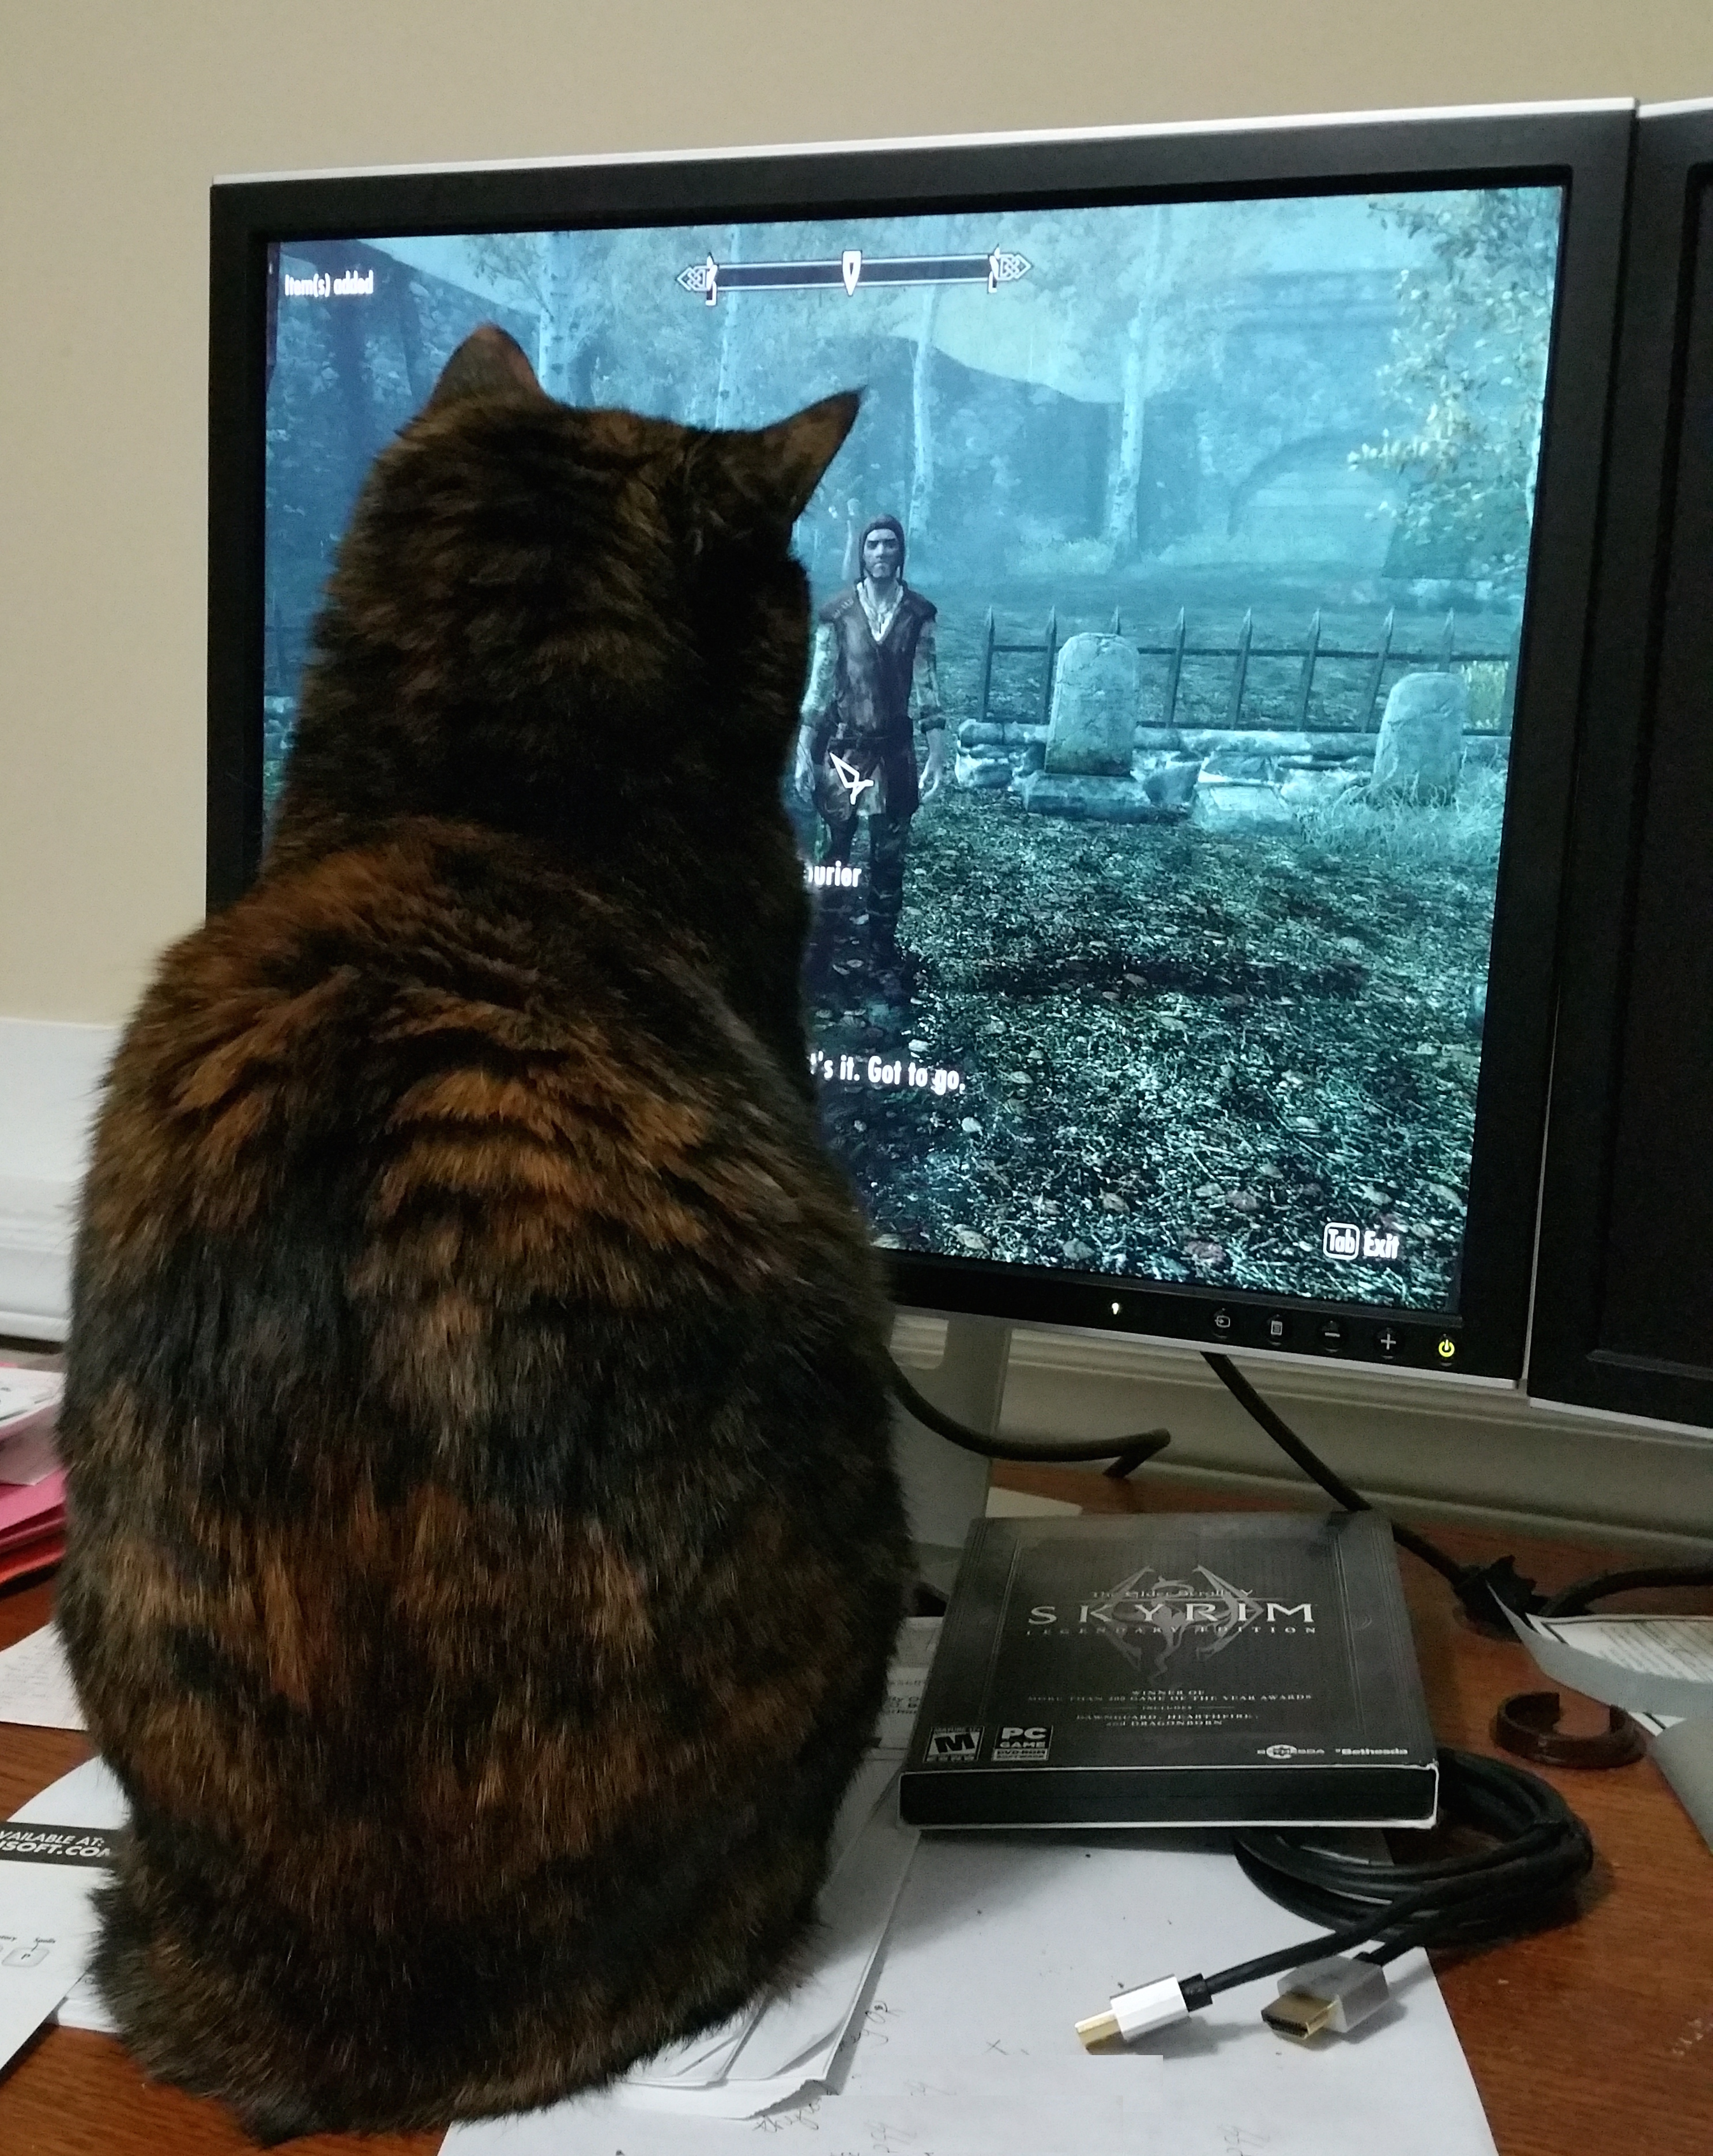 Phaedra playing Skyrim